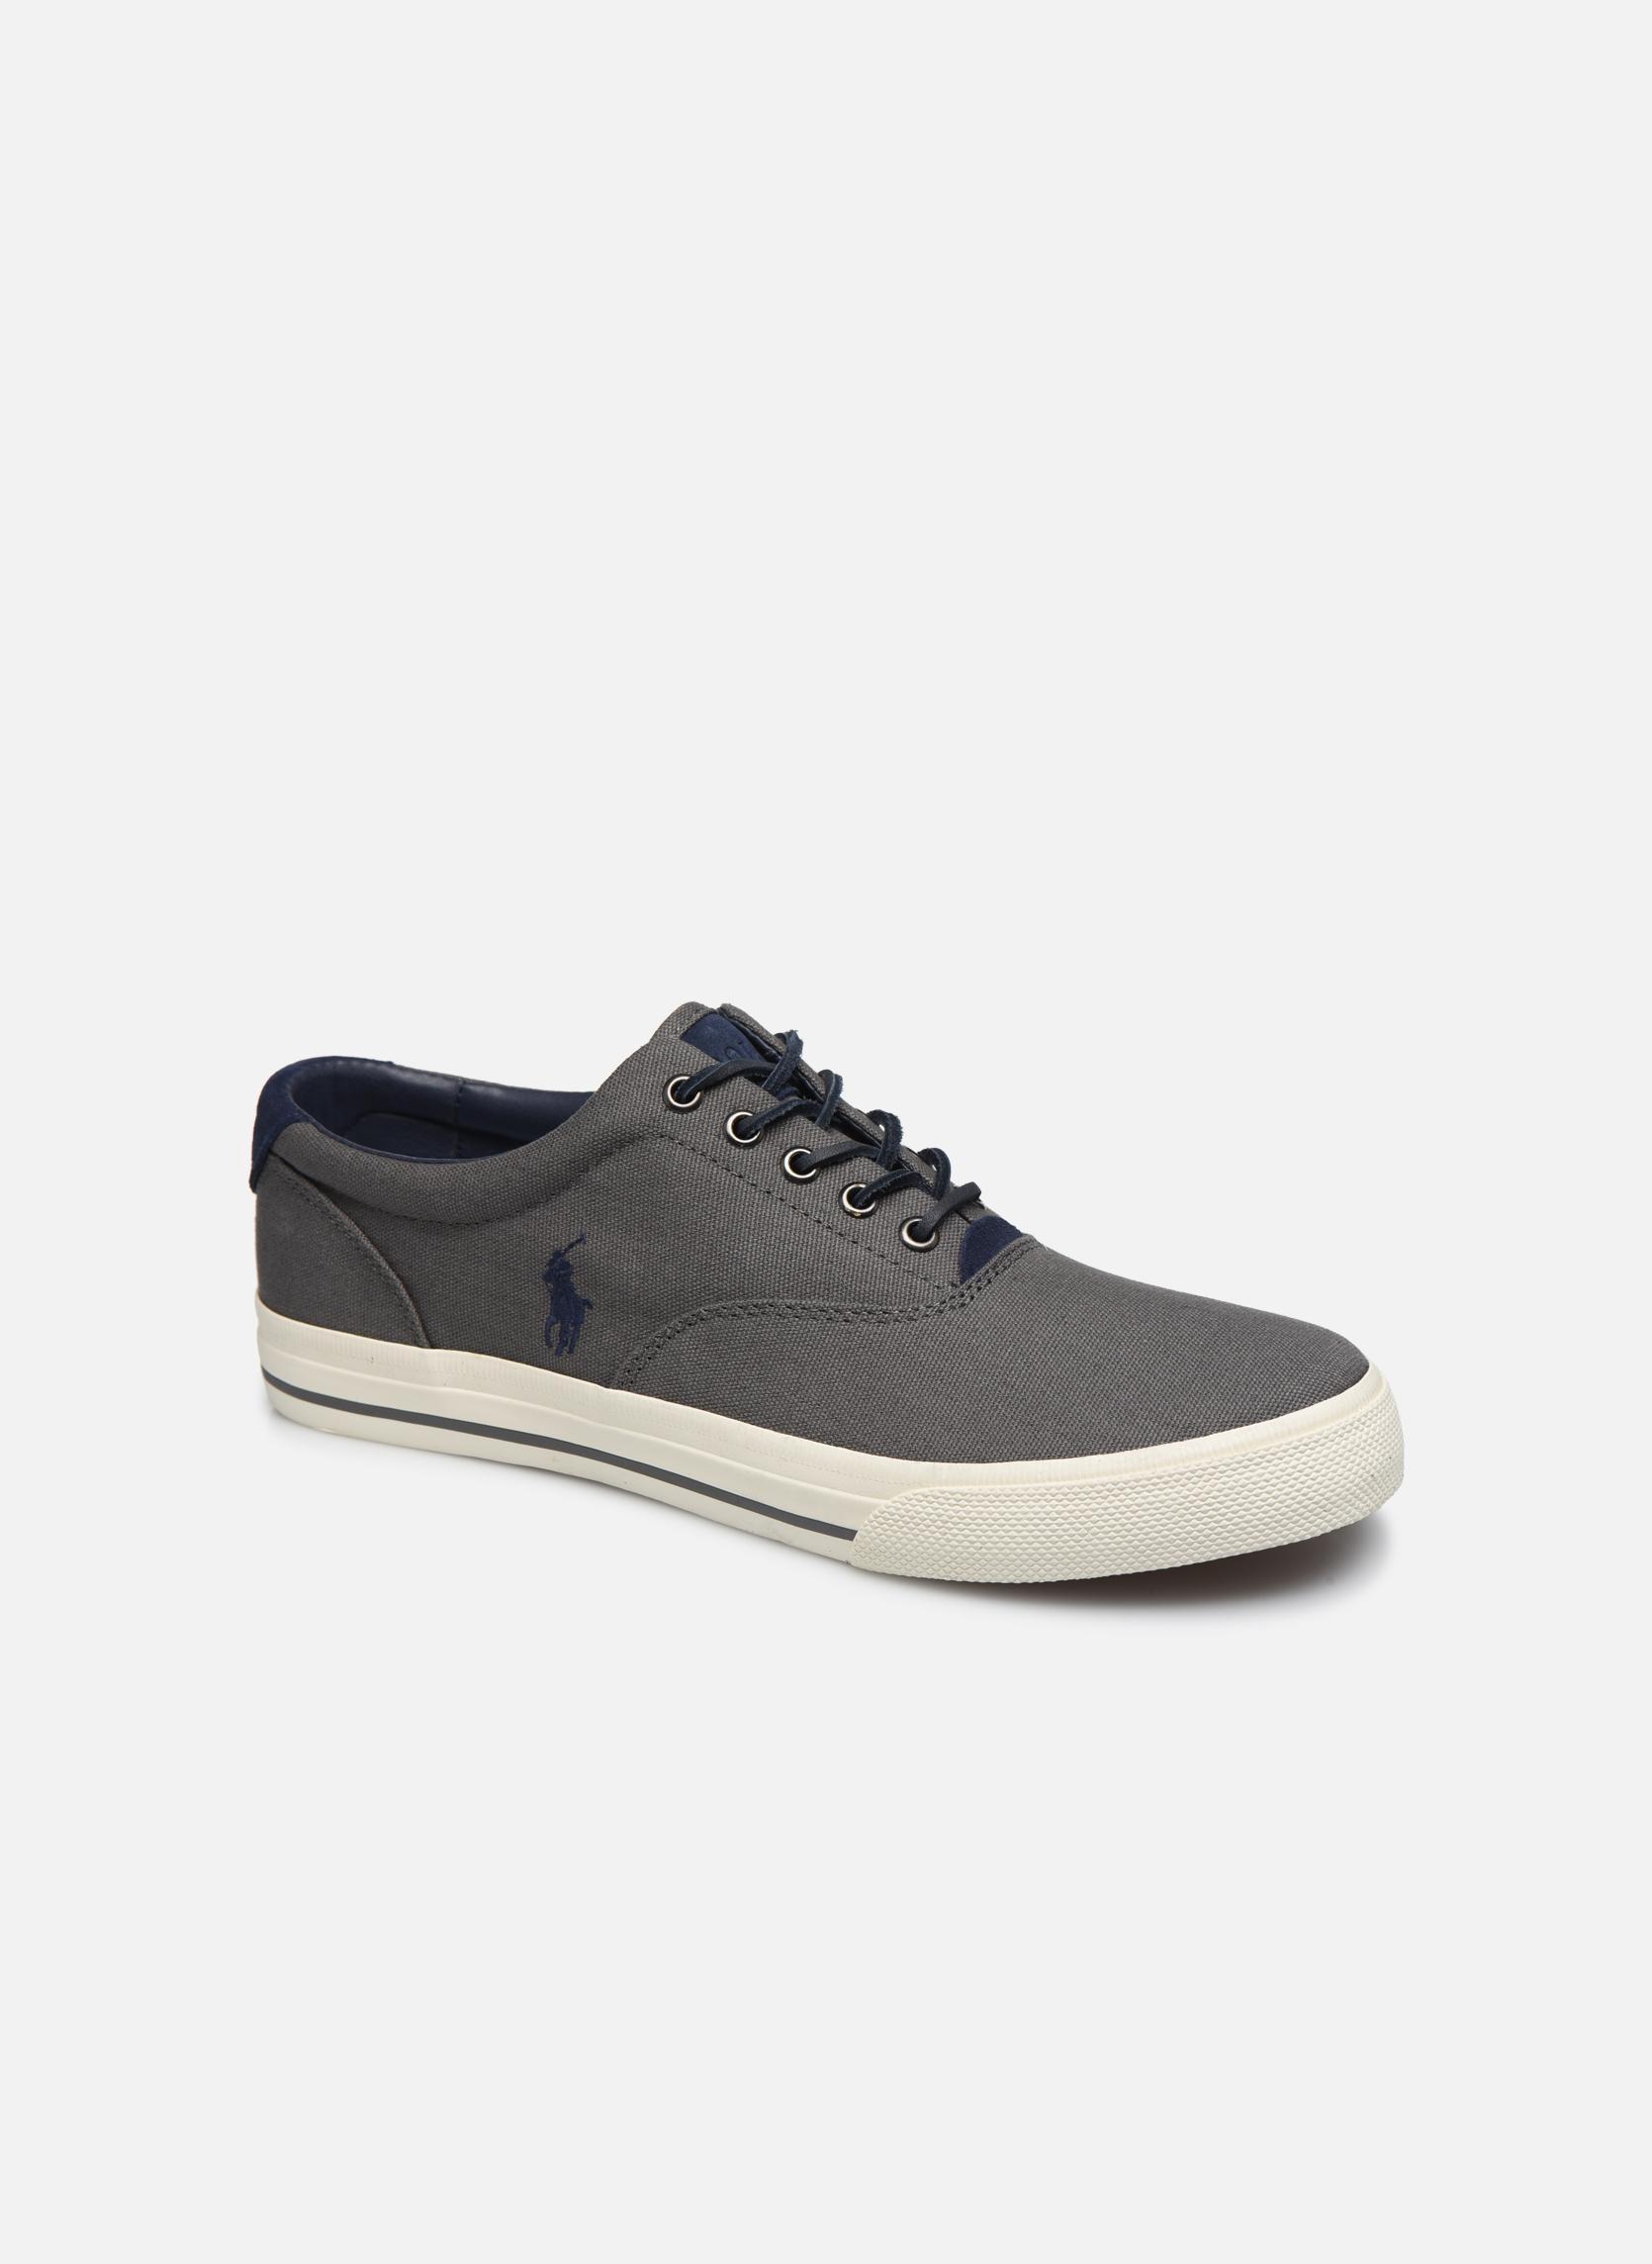 Polo Ralph Lauren Vaughn-Ne-Sneakers-Vulc